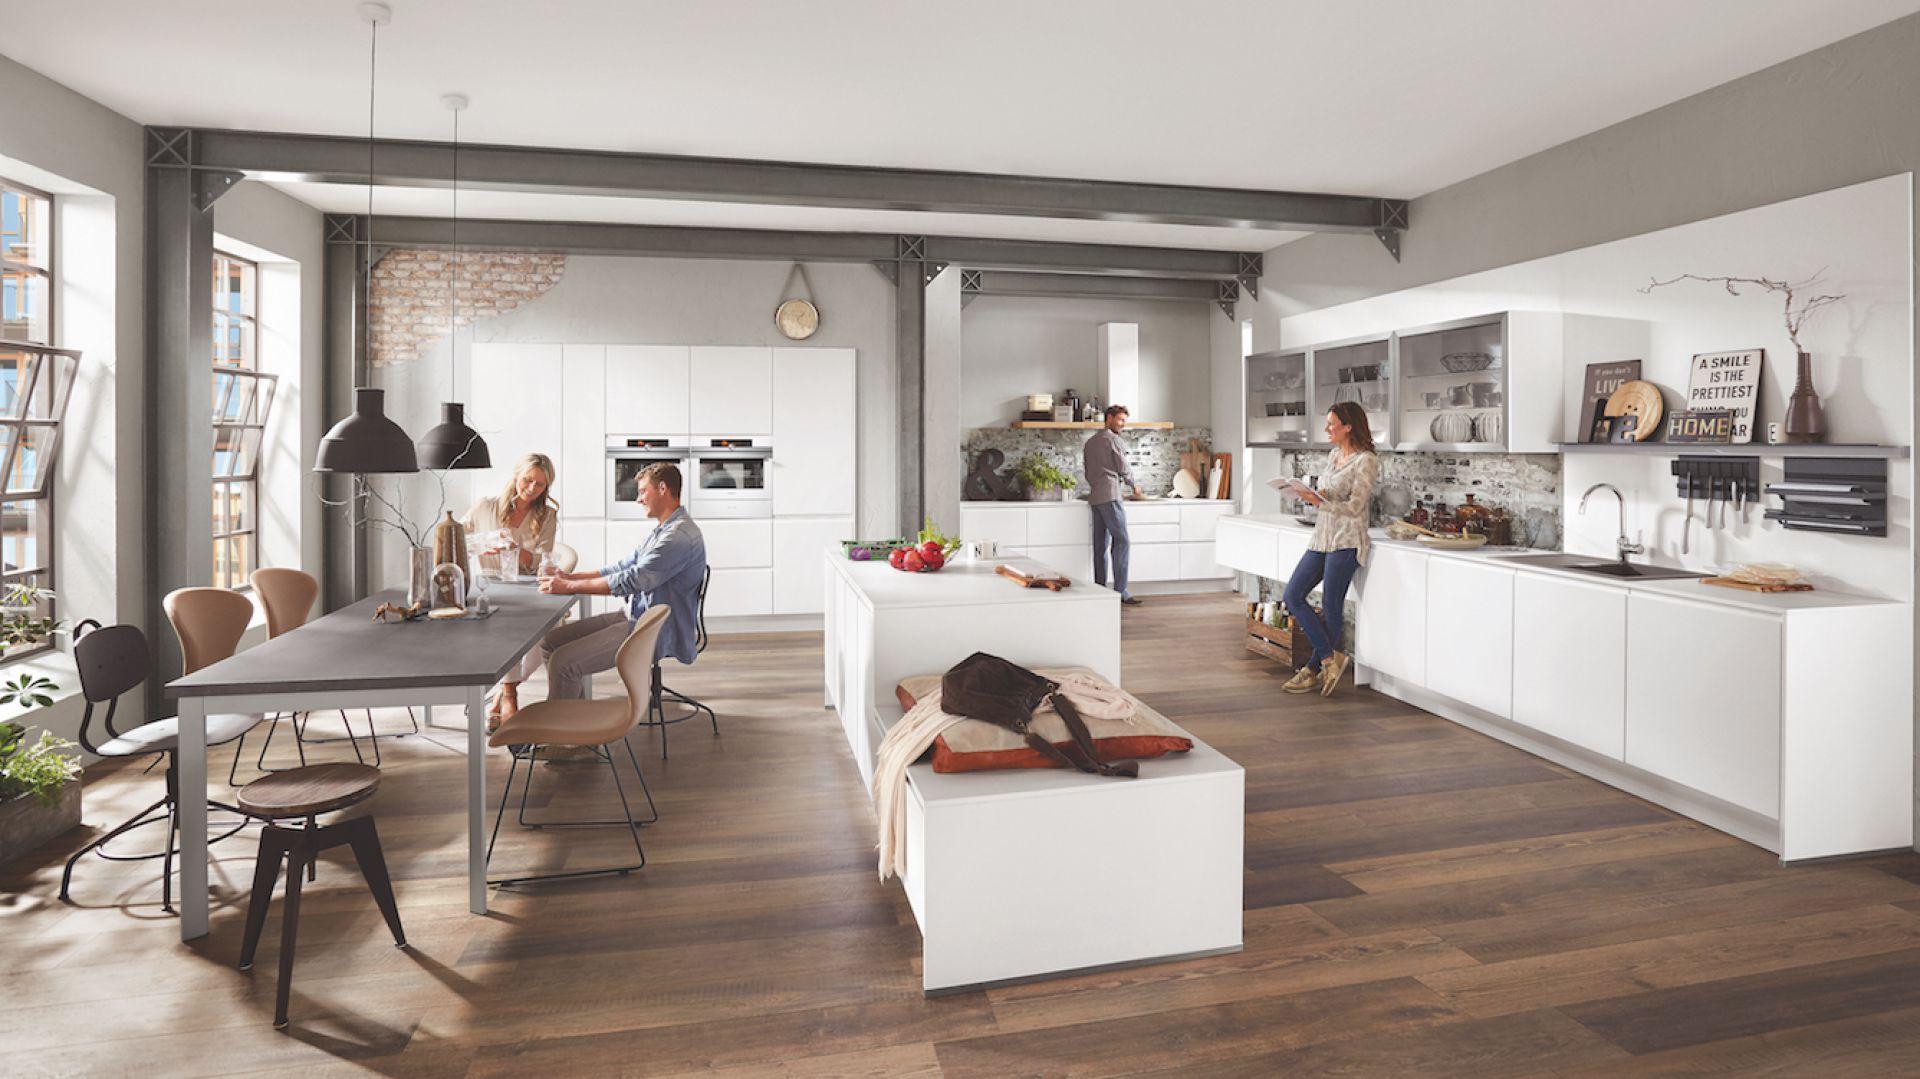 Kuchnia towarzyska: model nline 551. Fot. Verle Küchen